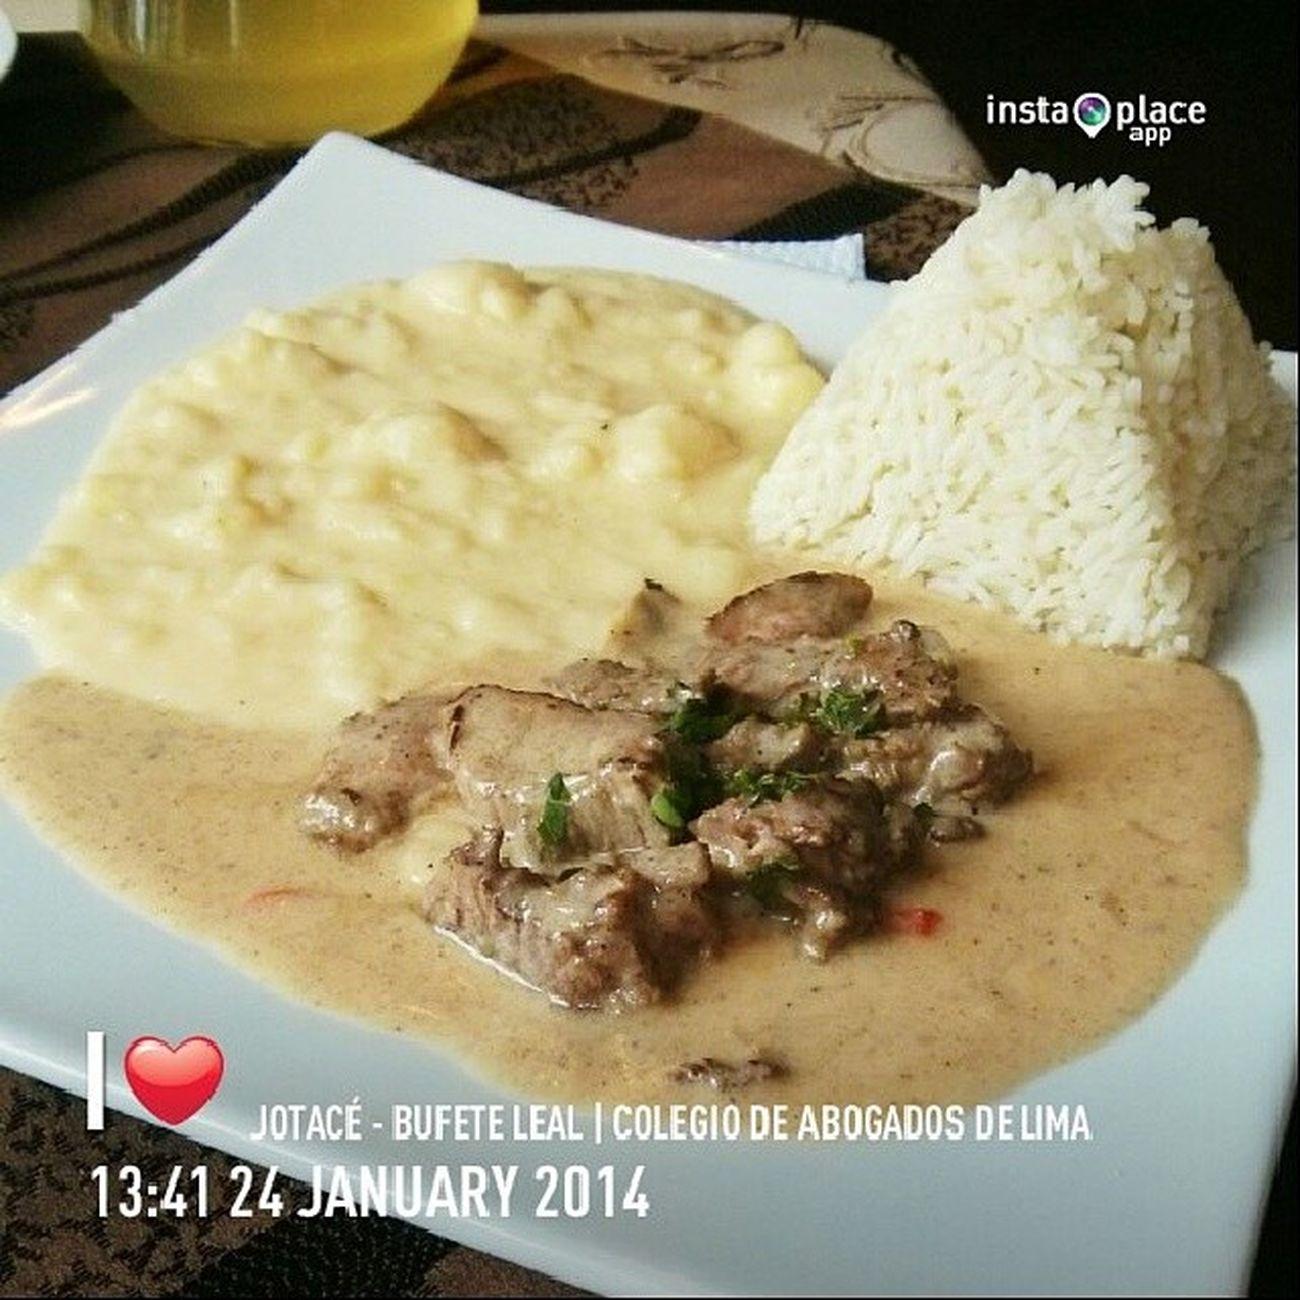 Lomo Stroganoff con su pure mas! | Foodporn Stroganoff Meat Carne Lunch LunchTime Almuerzo SanIsidro Lima Peru FuckingAwesome w/@caritodegregori